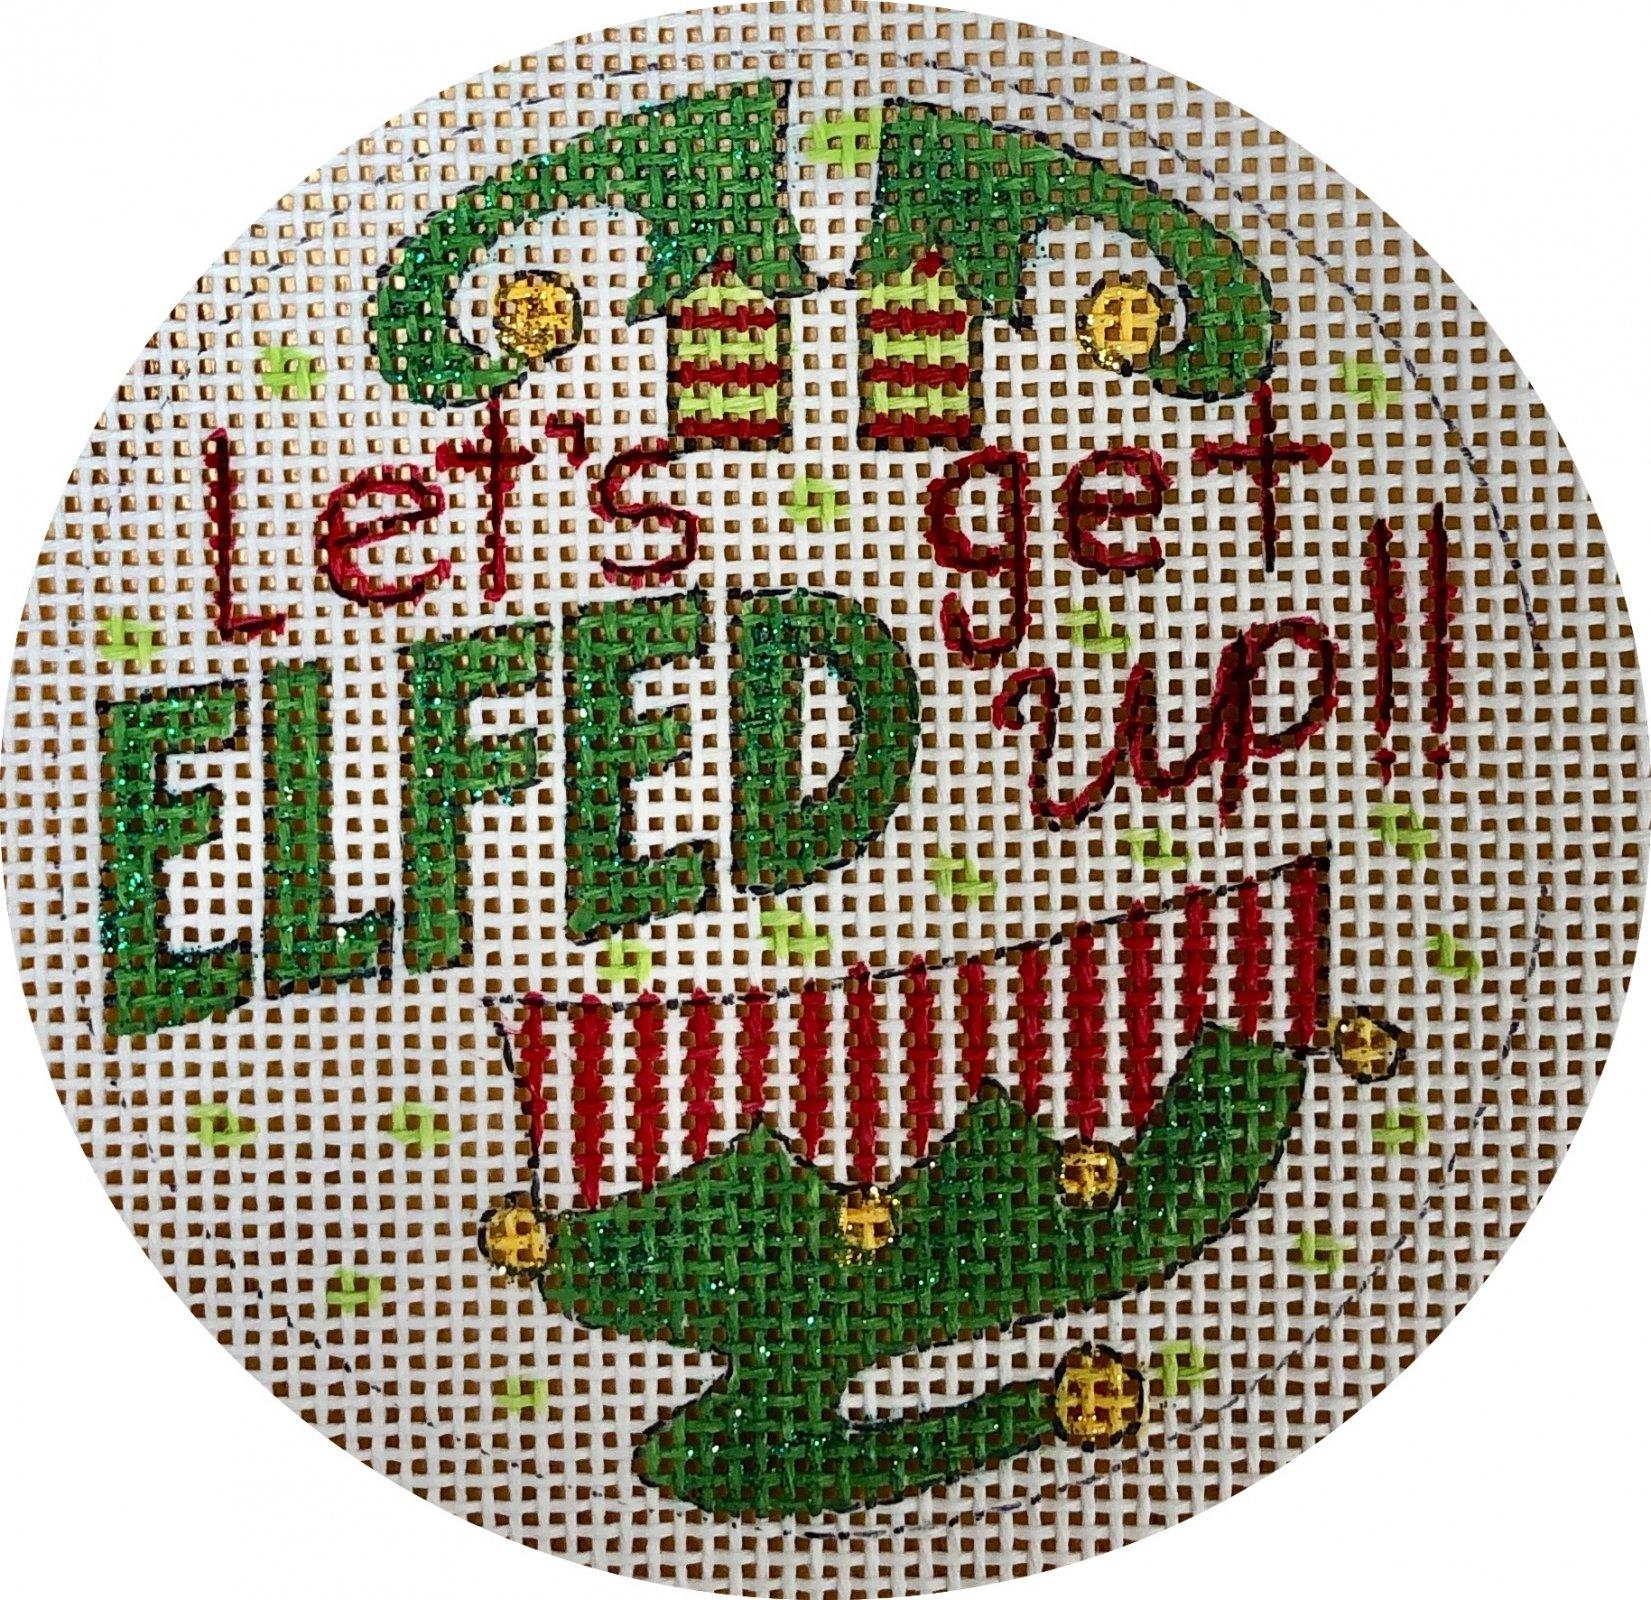 let's get elfed up